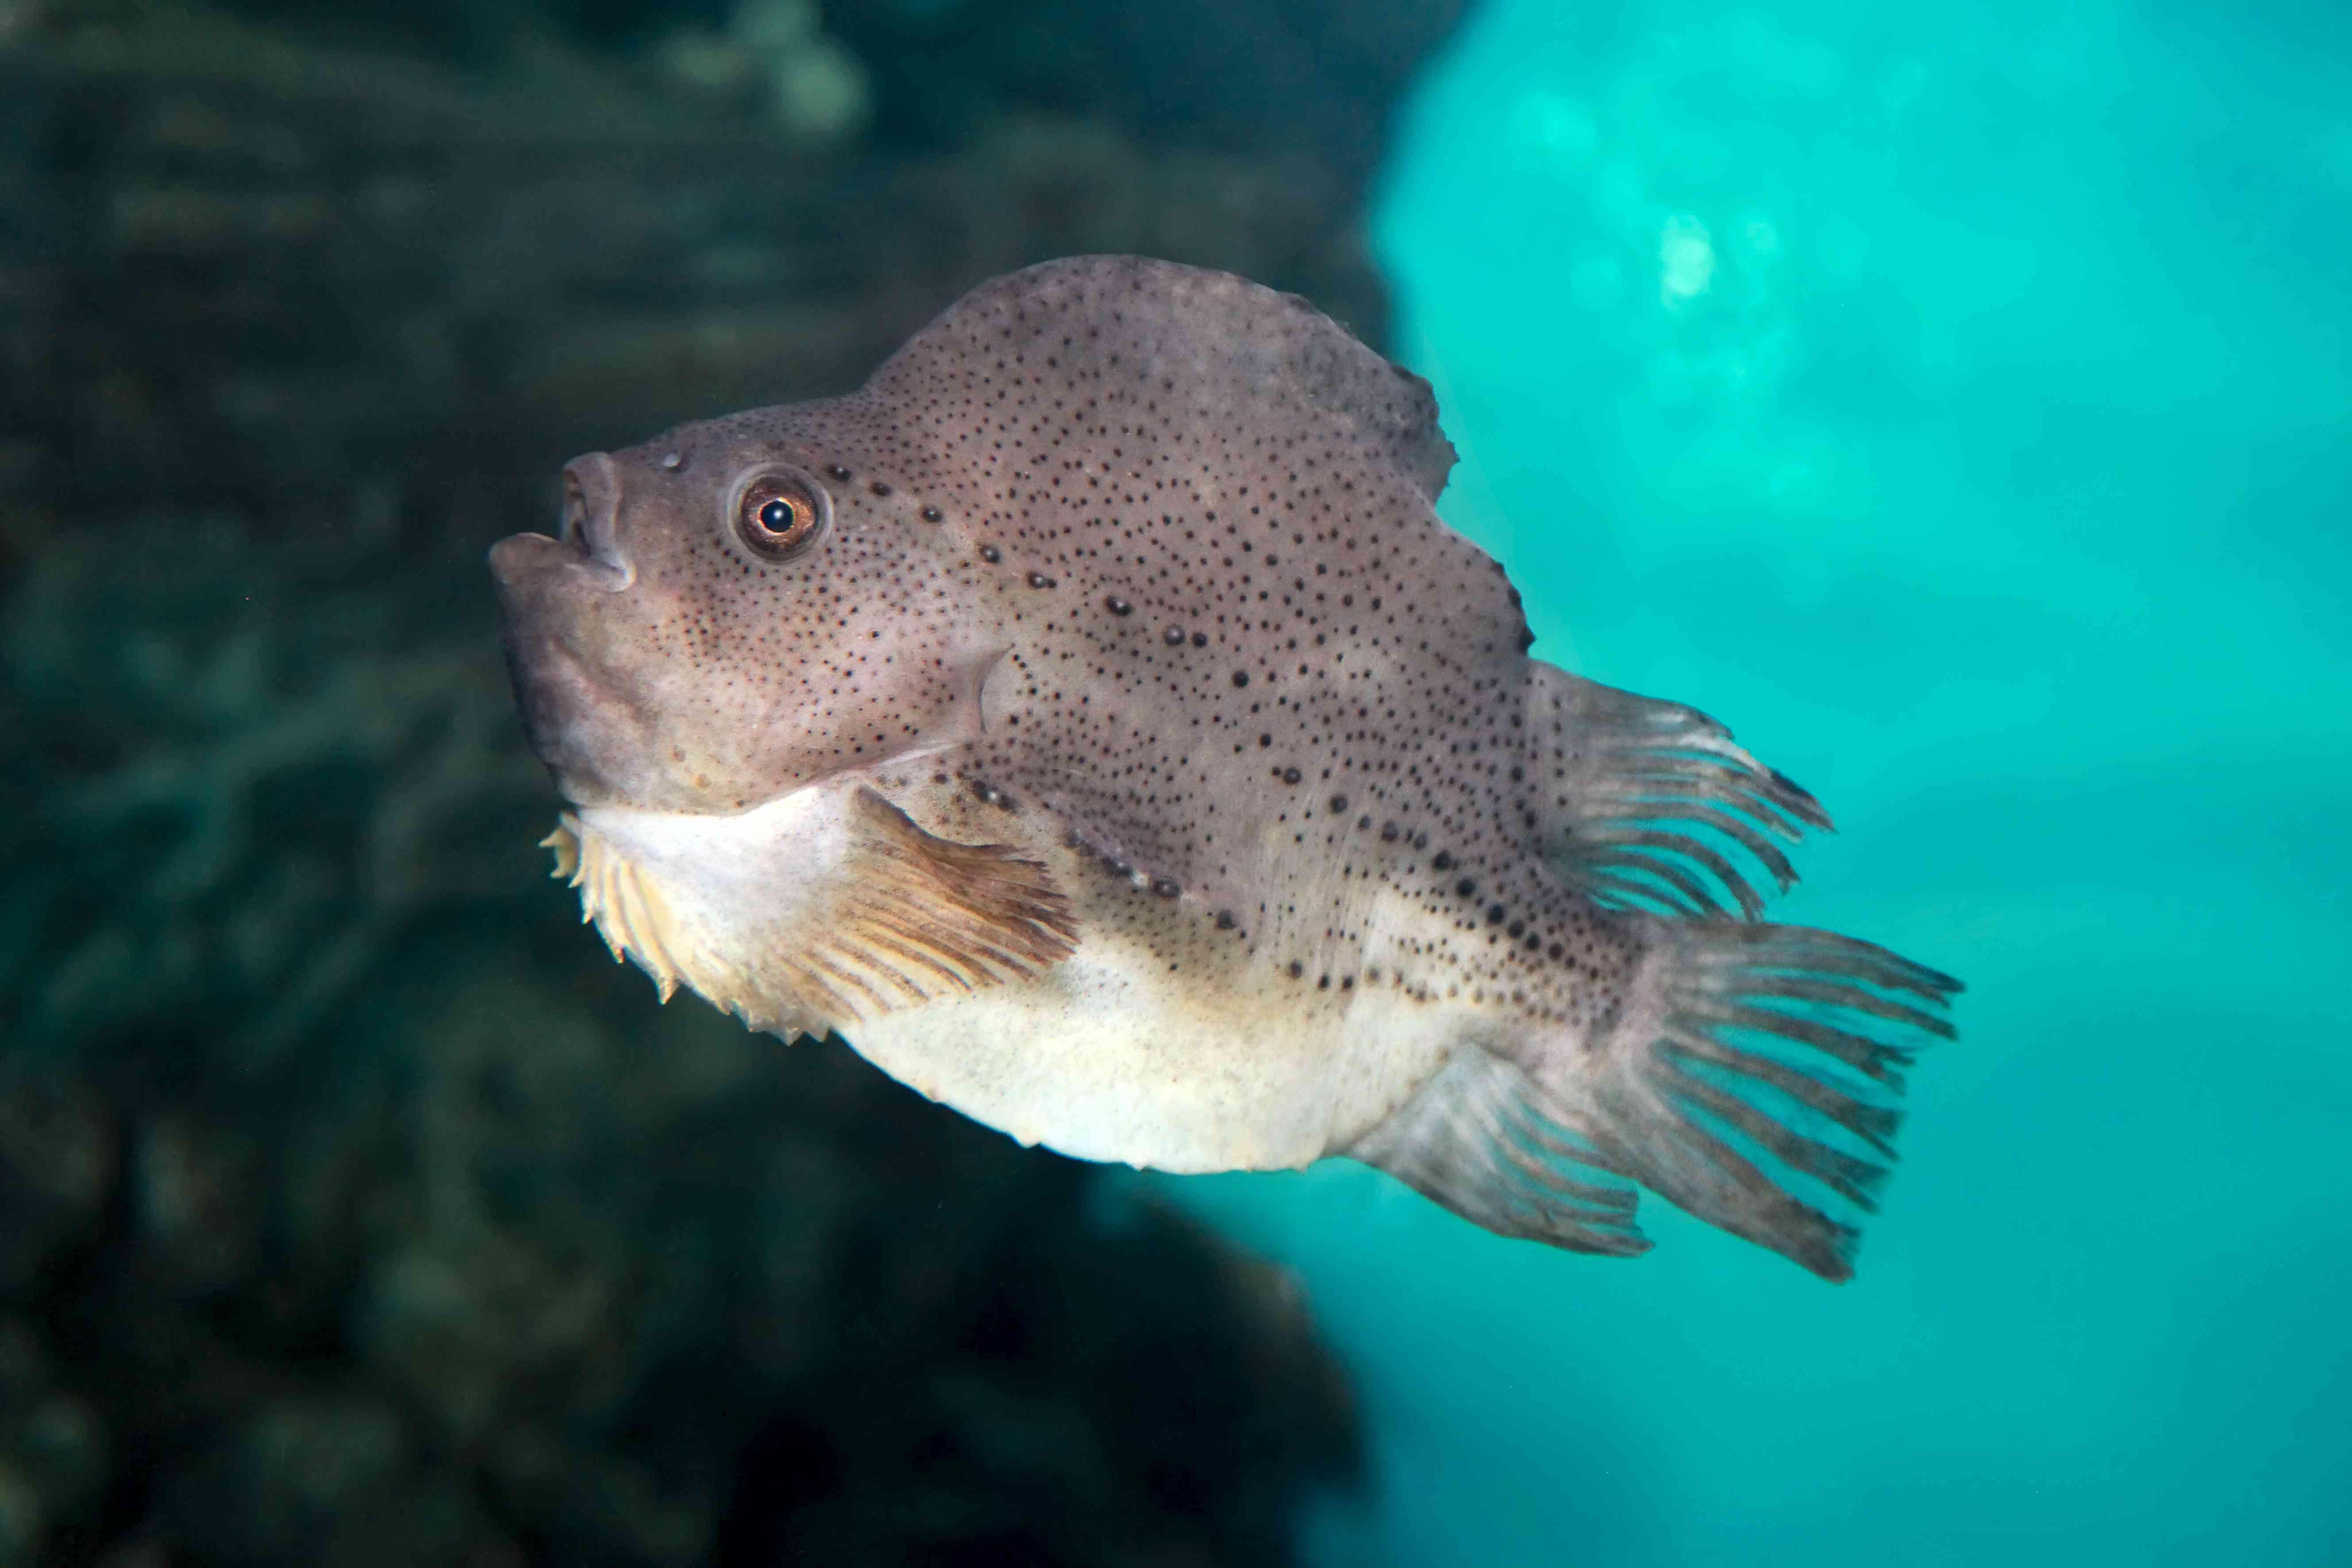 Cyclopterus lumpus, the lumpsucker or lumpfish